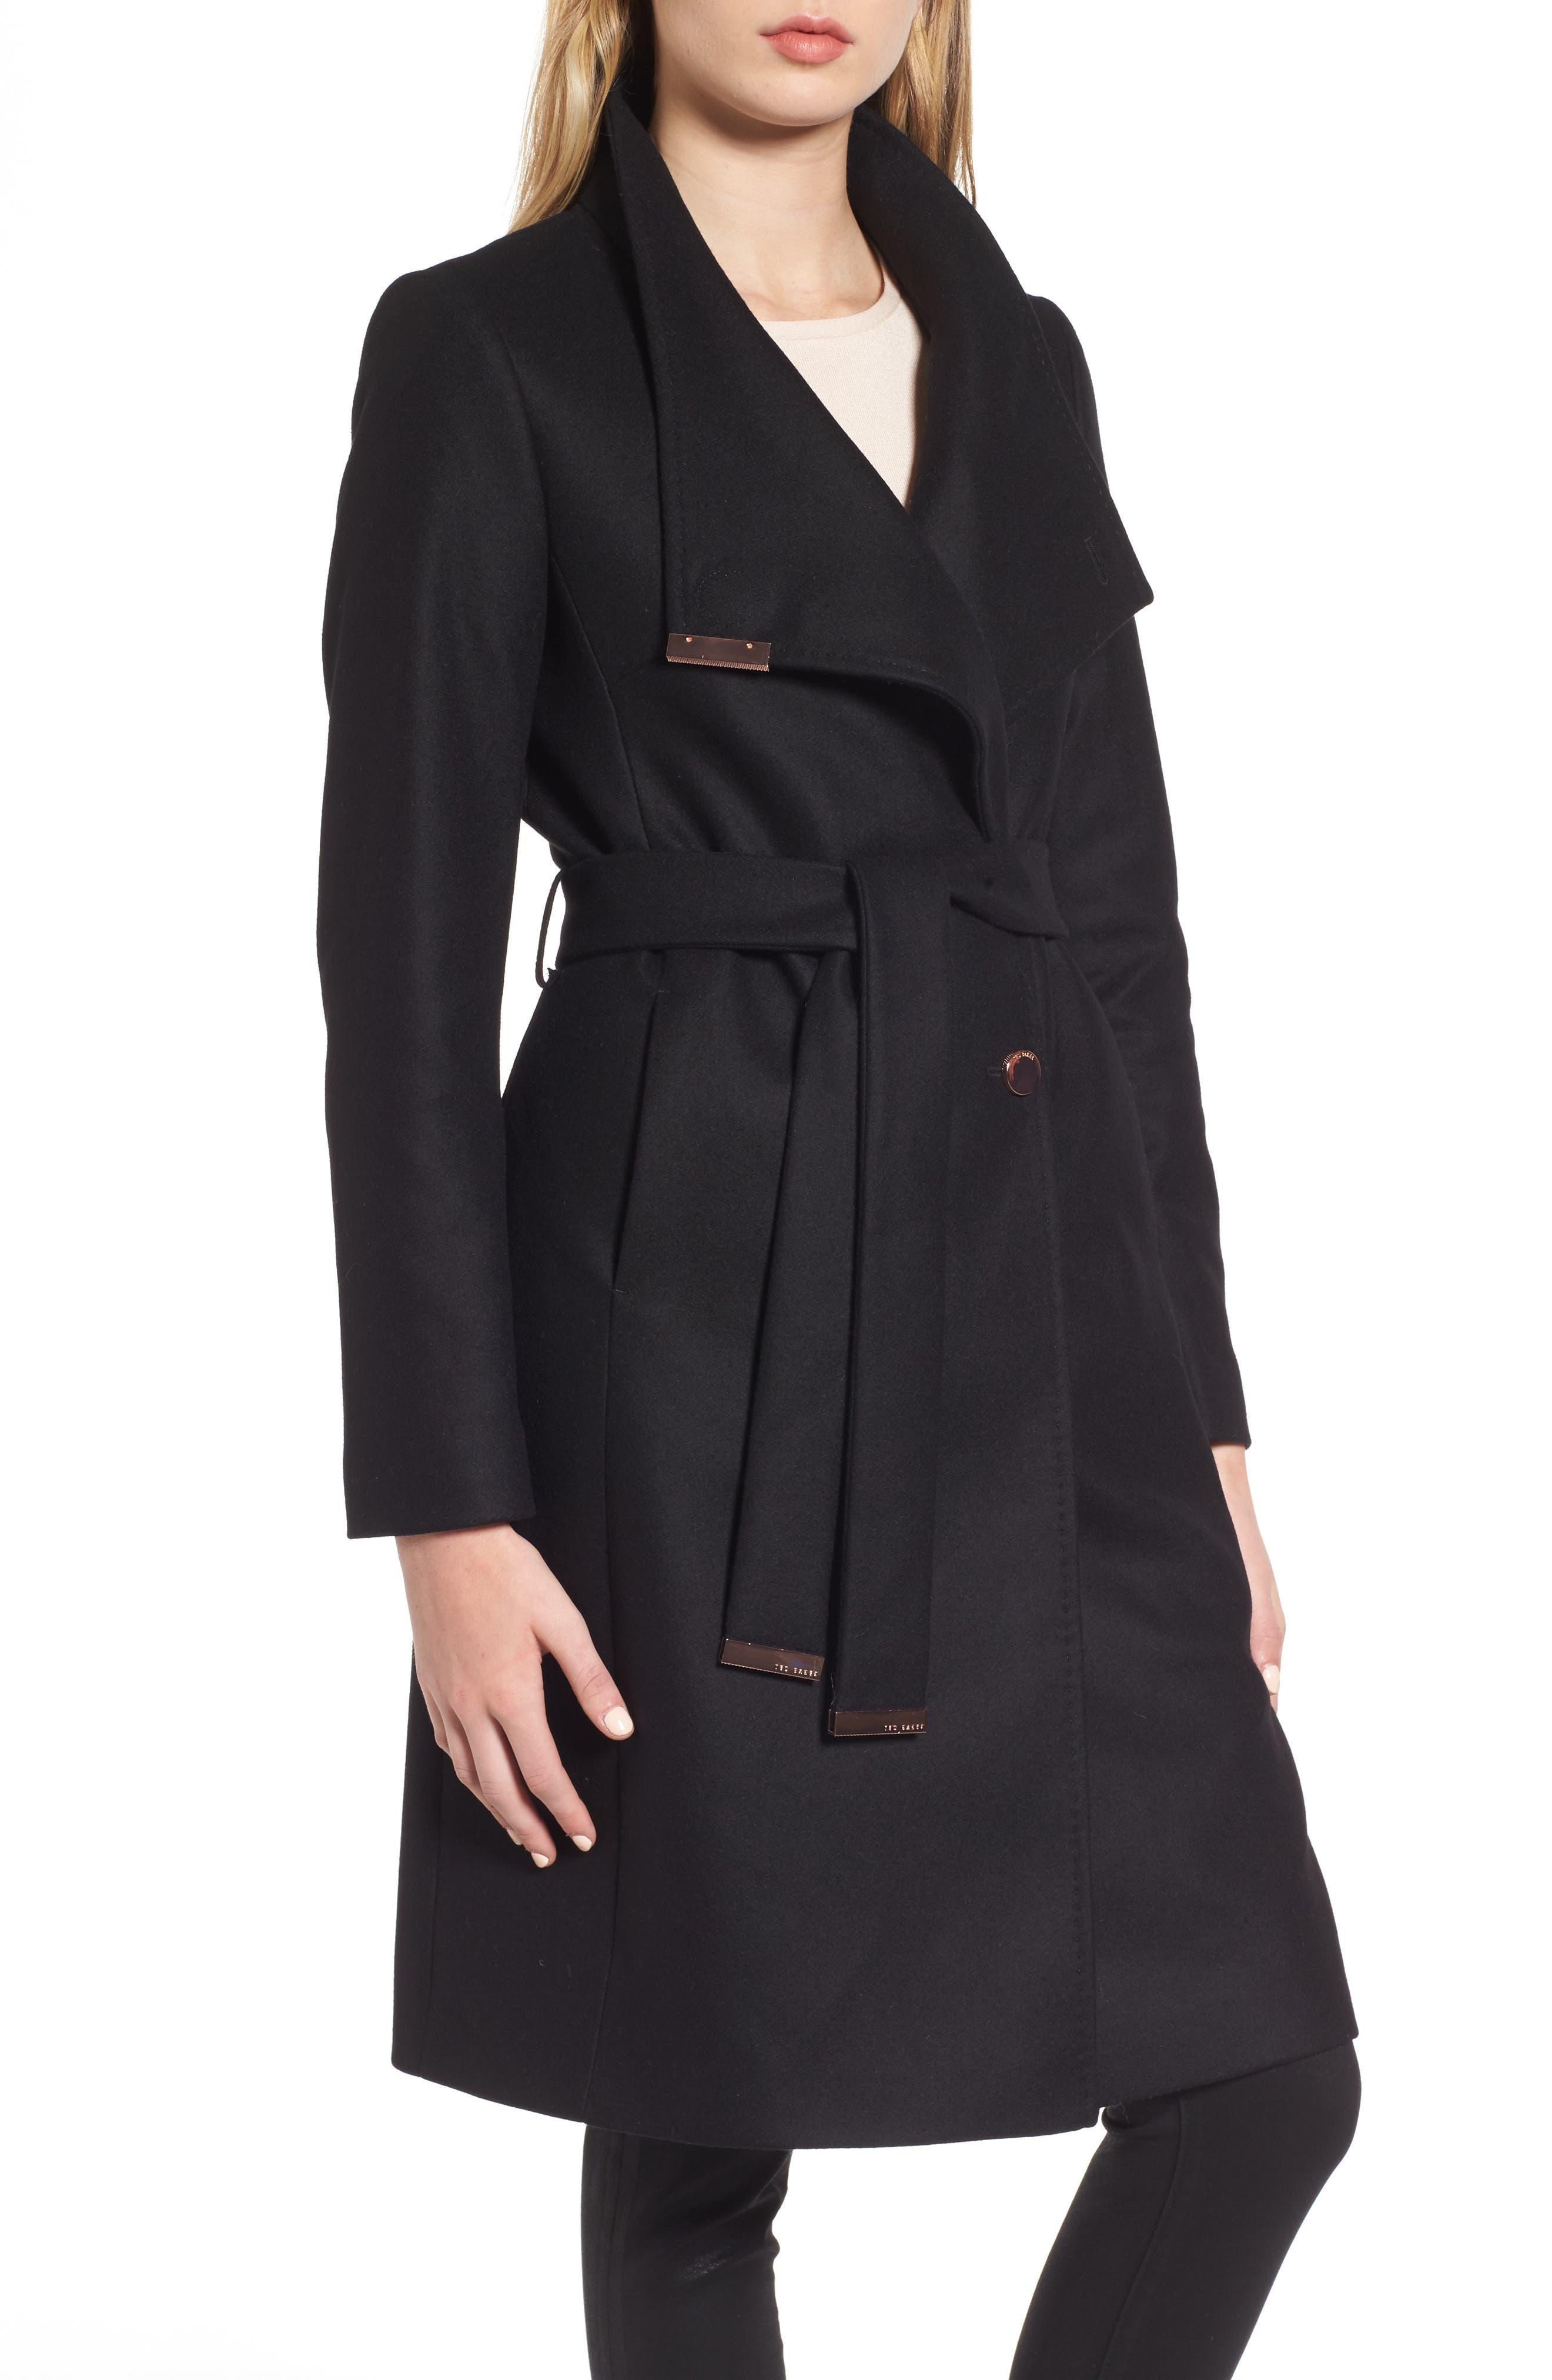 64d83c4577 Best women s fashion shop - Online shopping website for women ...